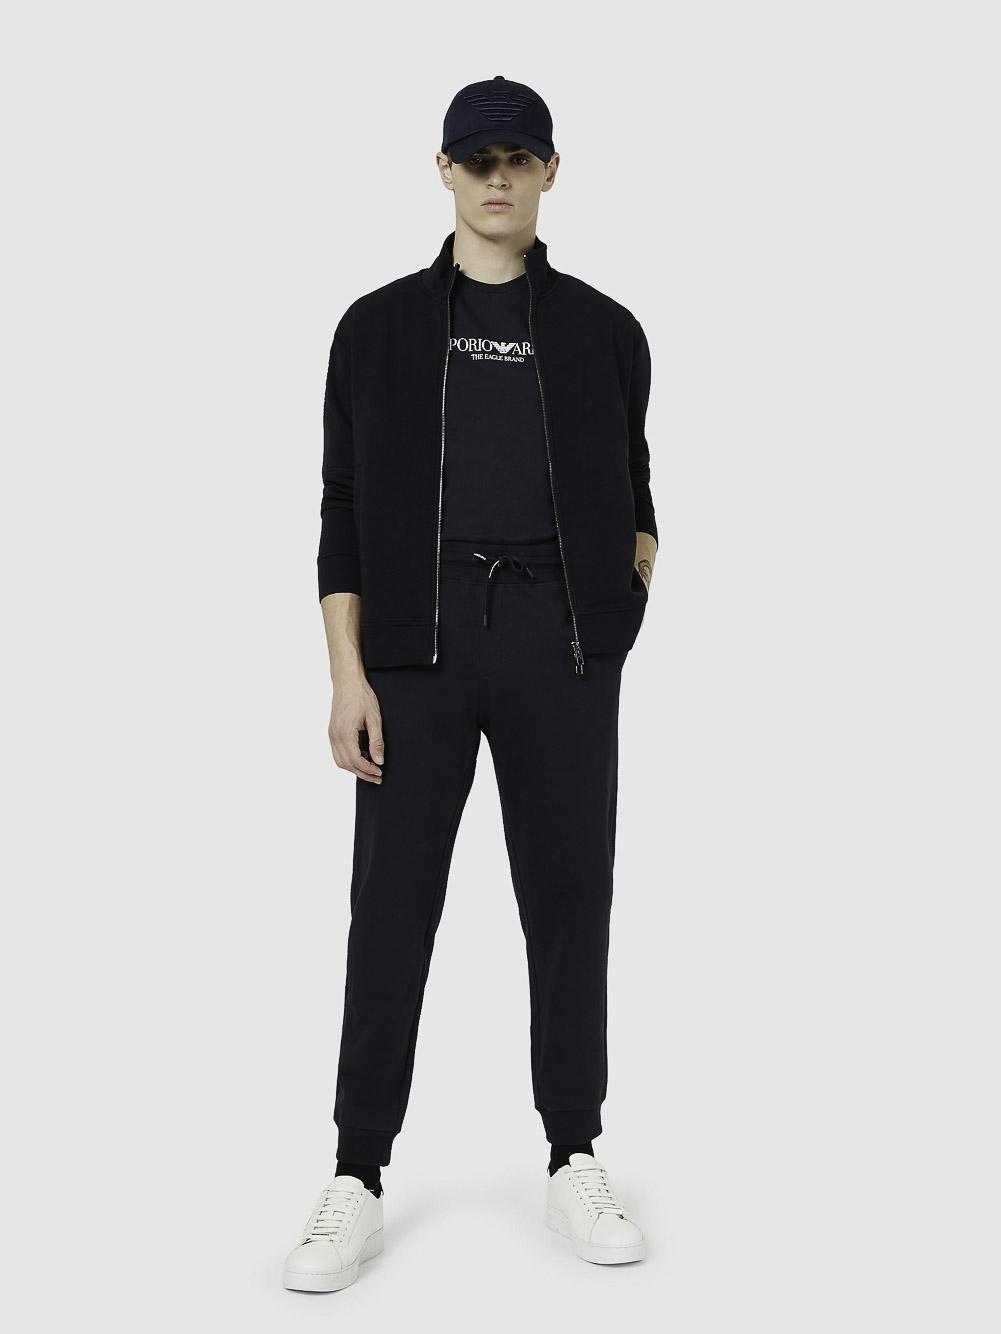 EMPORIO ARMANI Μπλούζα t-shirt 8N1T611J00Z-0922 ΜΠΛΕ